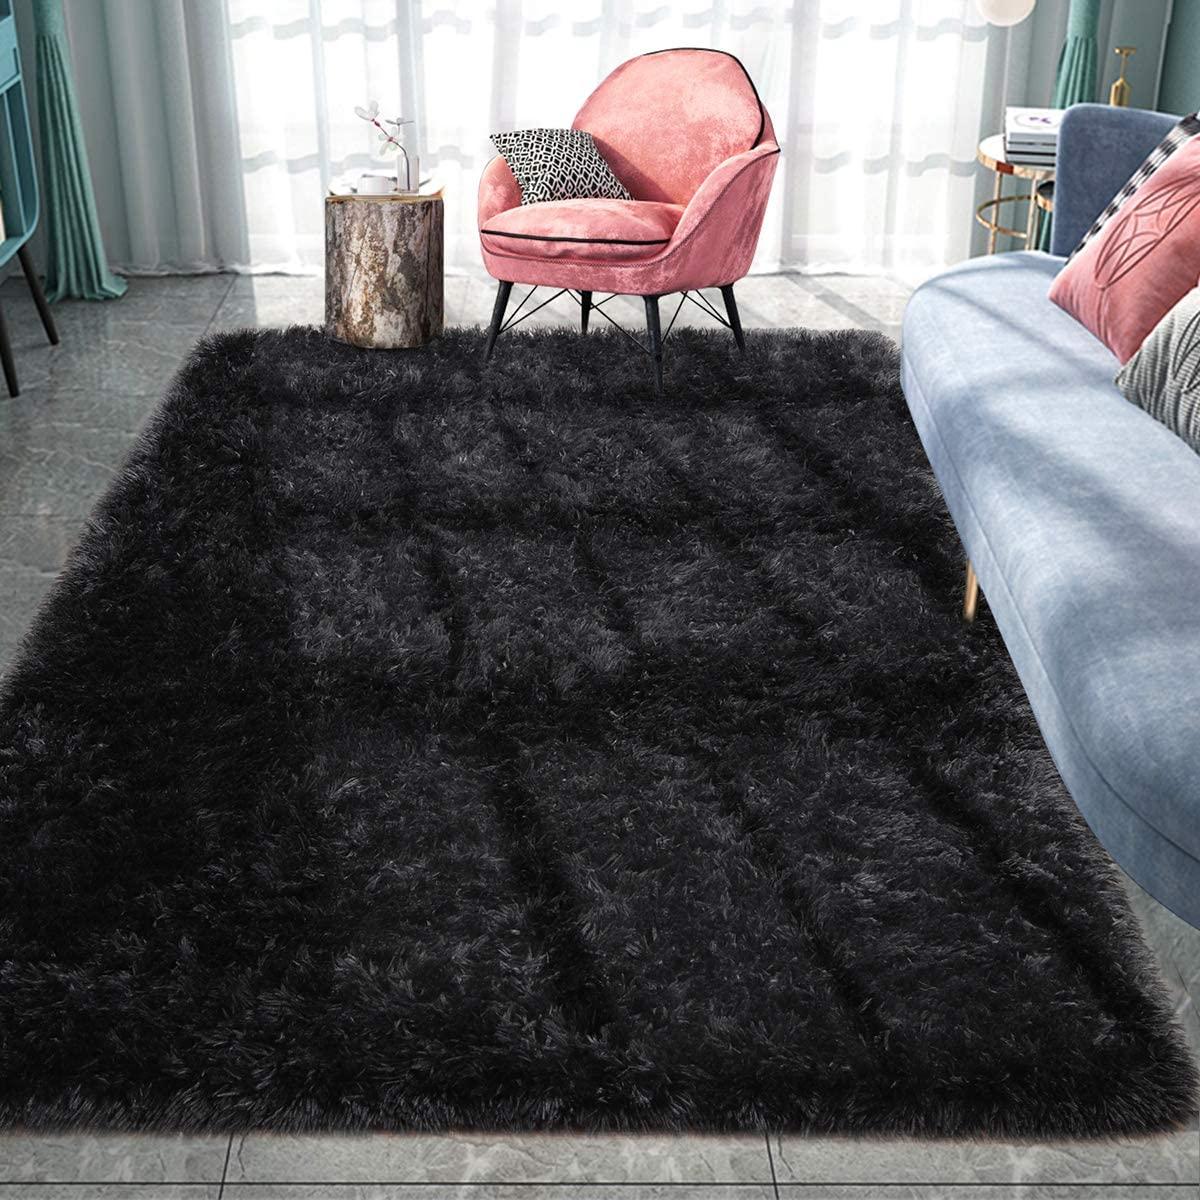 Pacapet Fluffy Area Rugs, Black Shag Rug for Bedroom, Plush Furry Rugs for Living Room, Fuzzy Carpet for Kid's Room, Nursery, Home Decor, 4 X 6 Feet